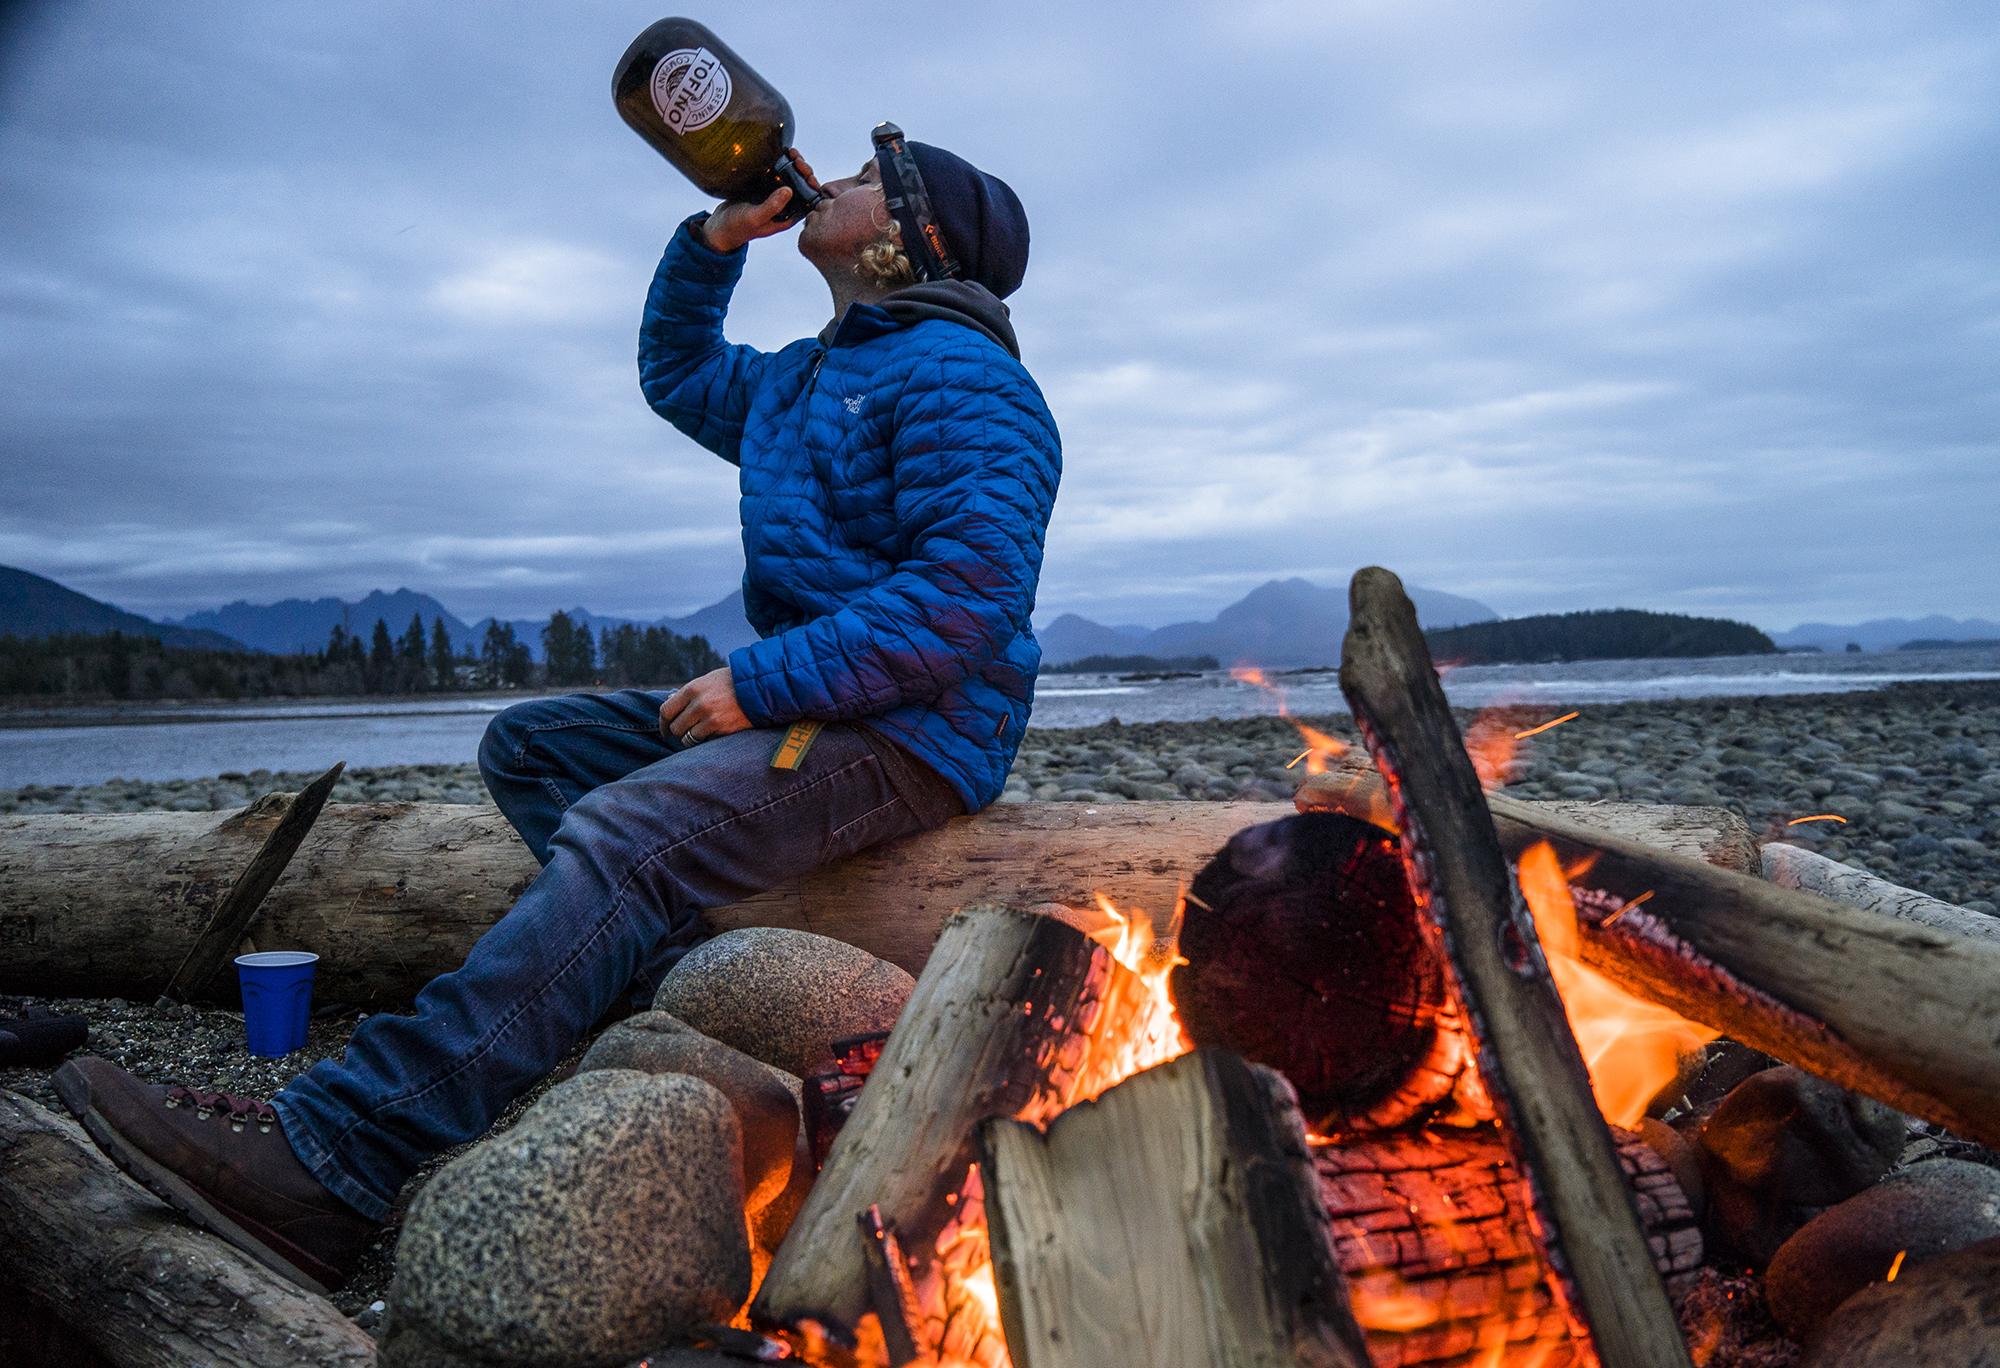 David Carrier Porcheron. Vancouver Island, British Columbia. Photography by Chris Burkard.